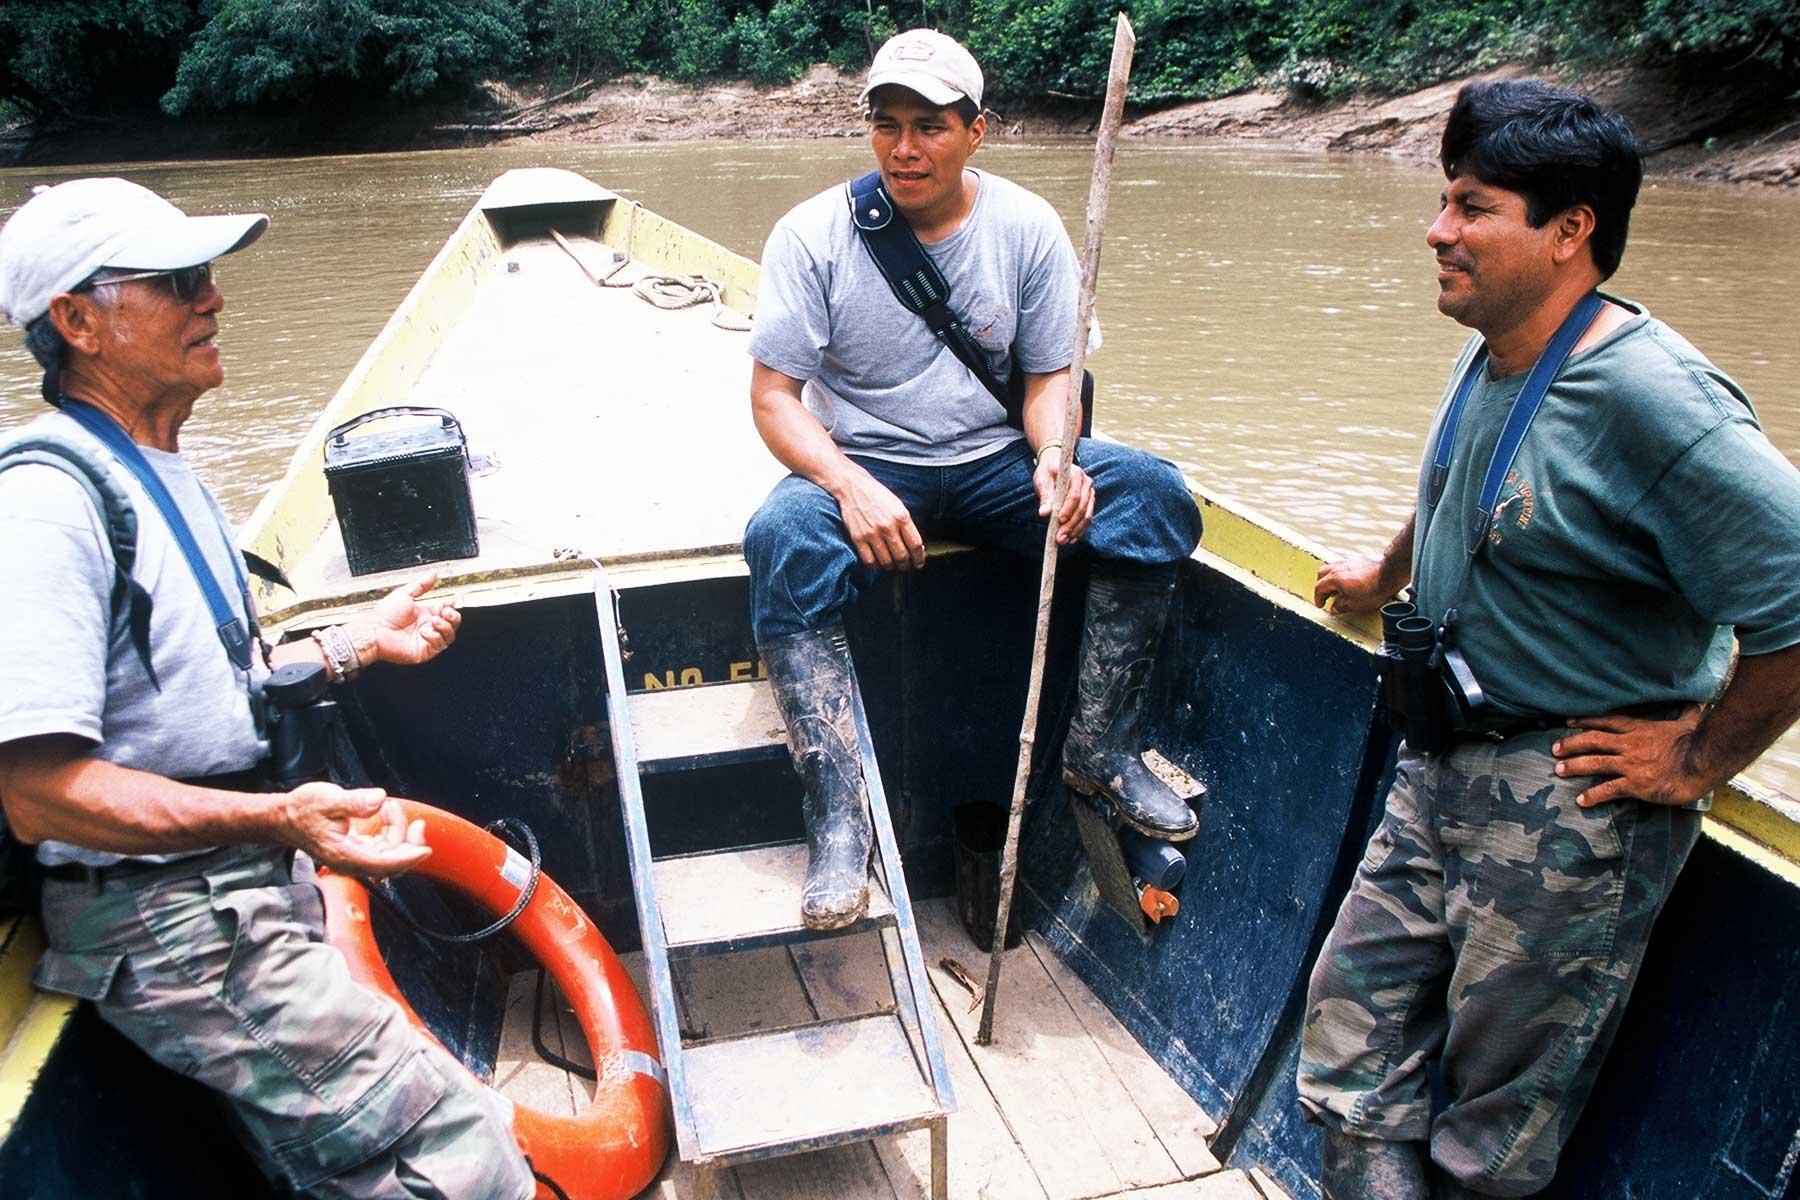 Quechua Indian Guides | Amazon Photo Journal | Dr Steven A Martin | Tiputini Biodiversity Station Ecuador